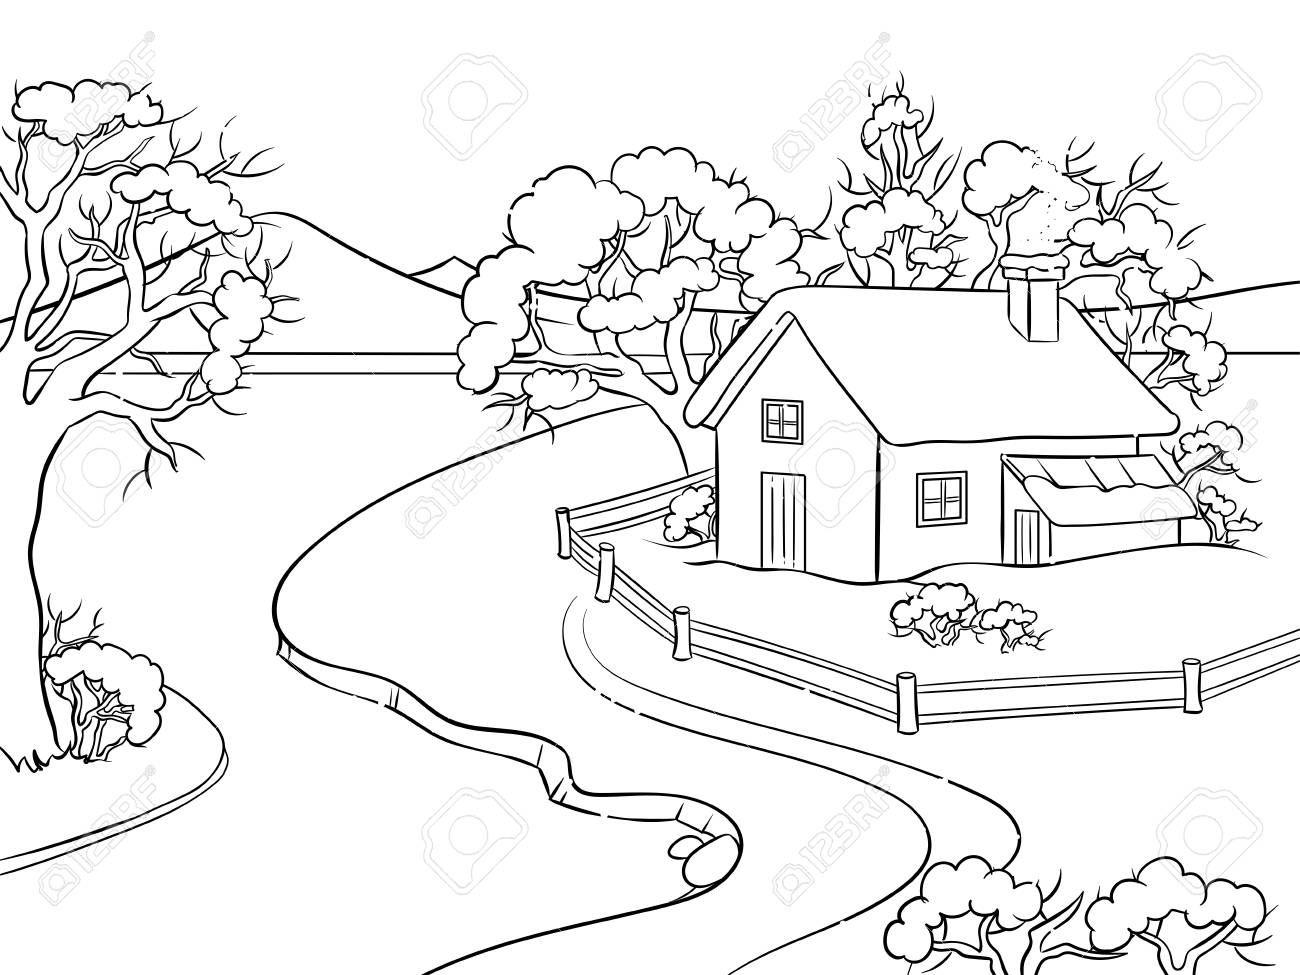 Winter Landscape Coloring Vector Illustration Isolated Image On White Background Comic Book Style Imitation Desenho De Paisagem Natural Vetores Paisagens